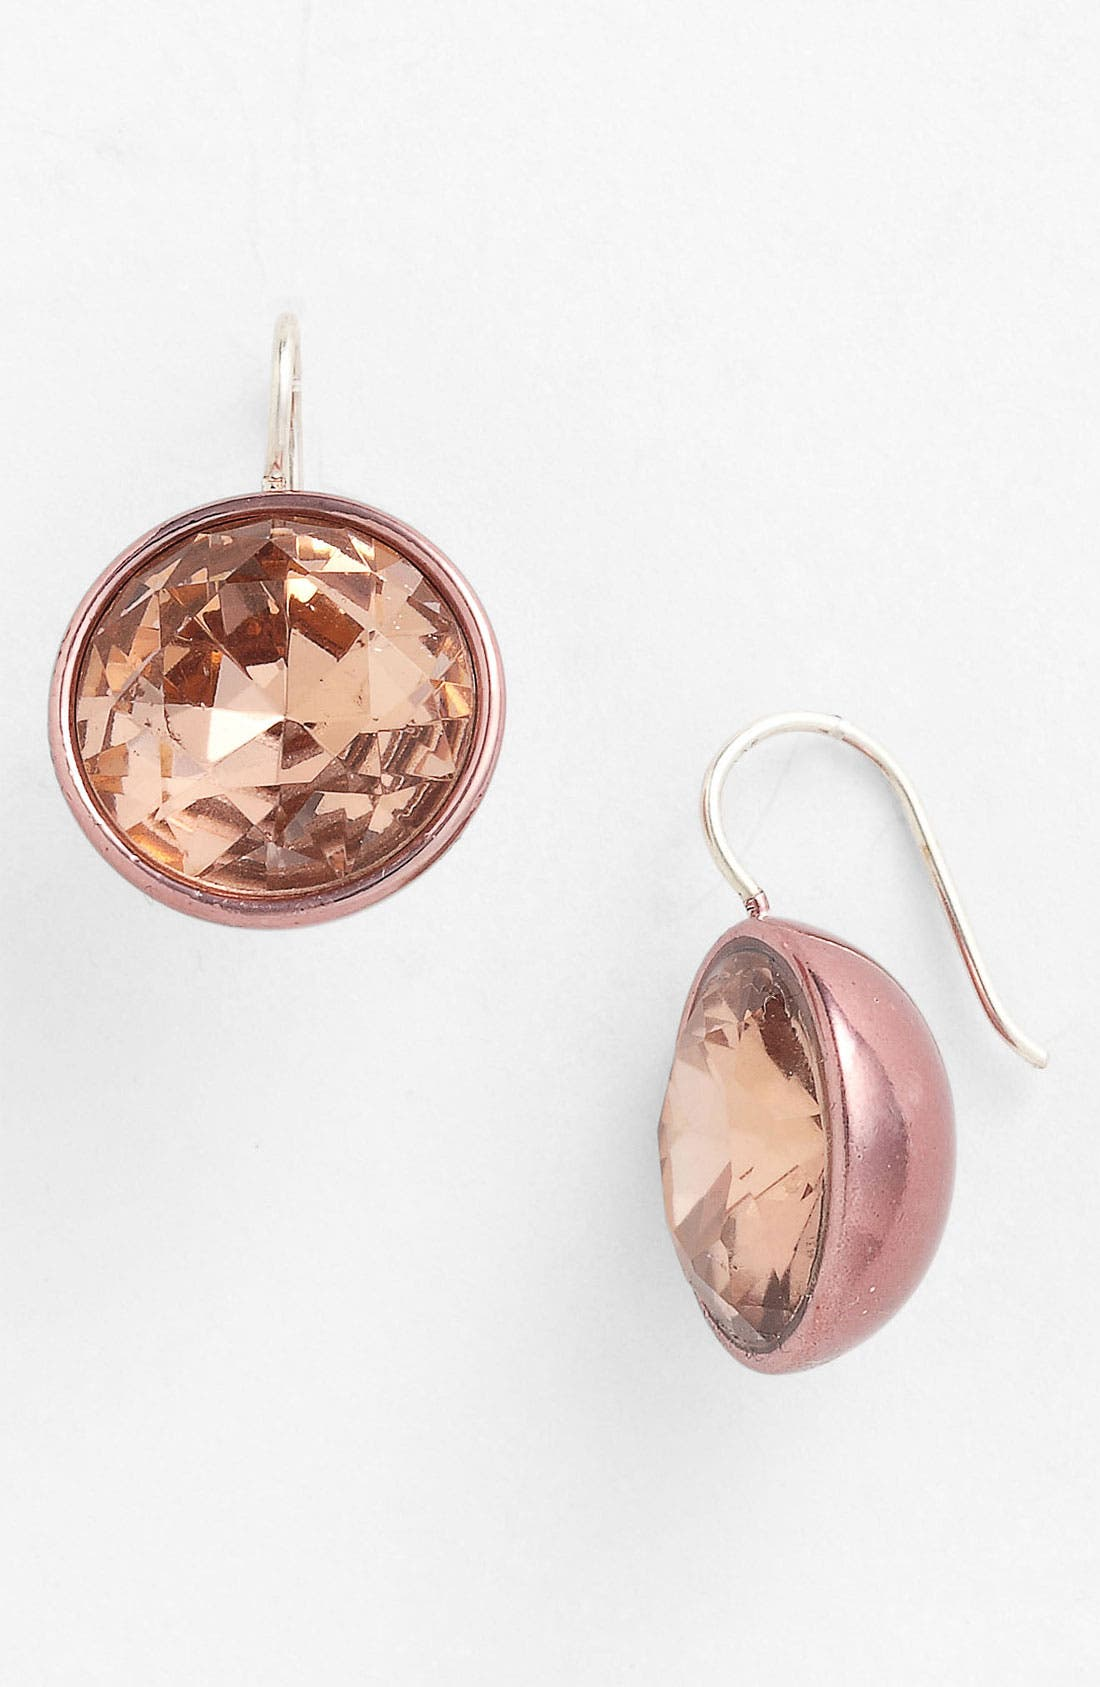 Alternate Image 1 Selected - Juicy Couture 'Glam Rocks' Drop Earrings